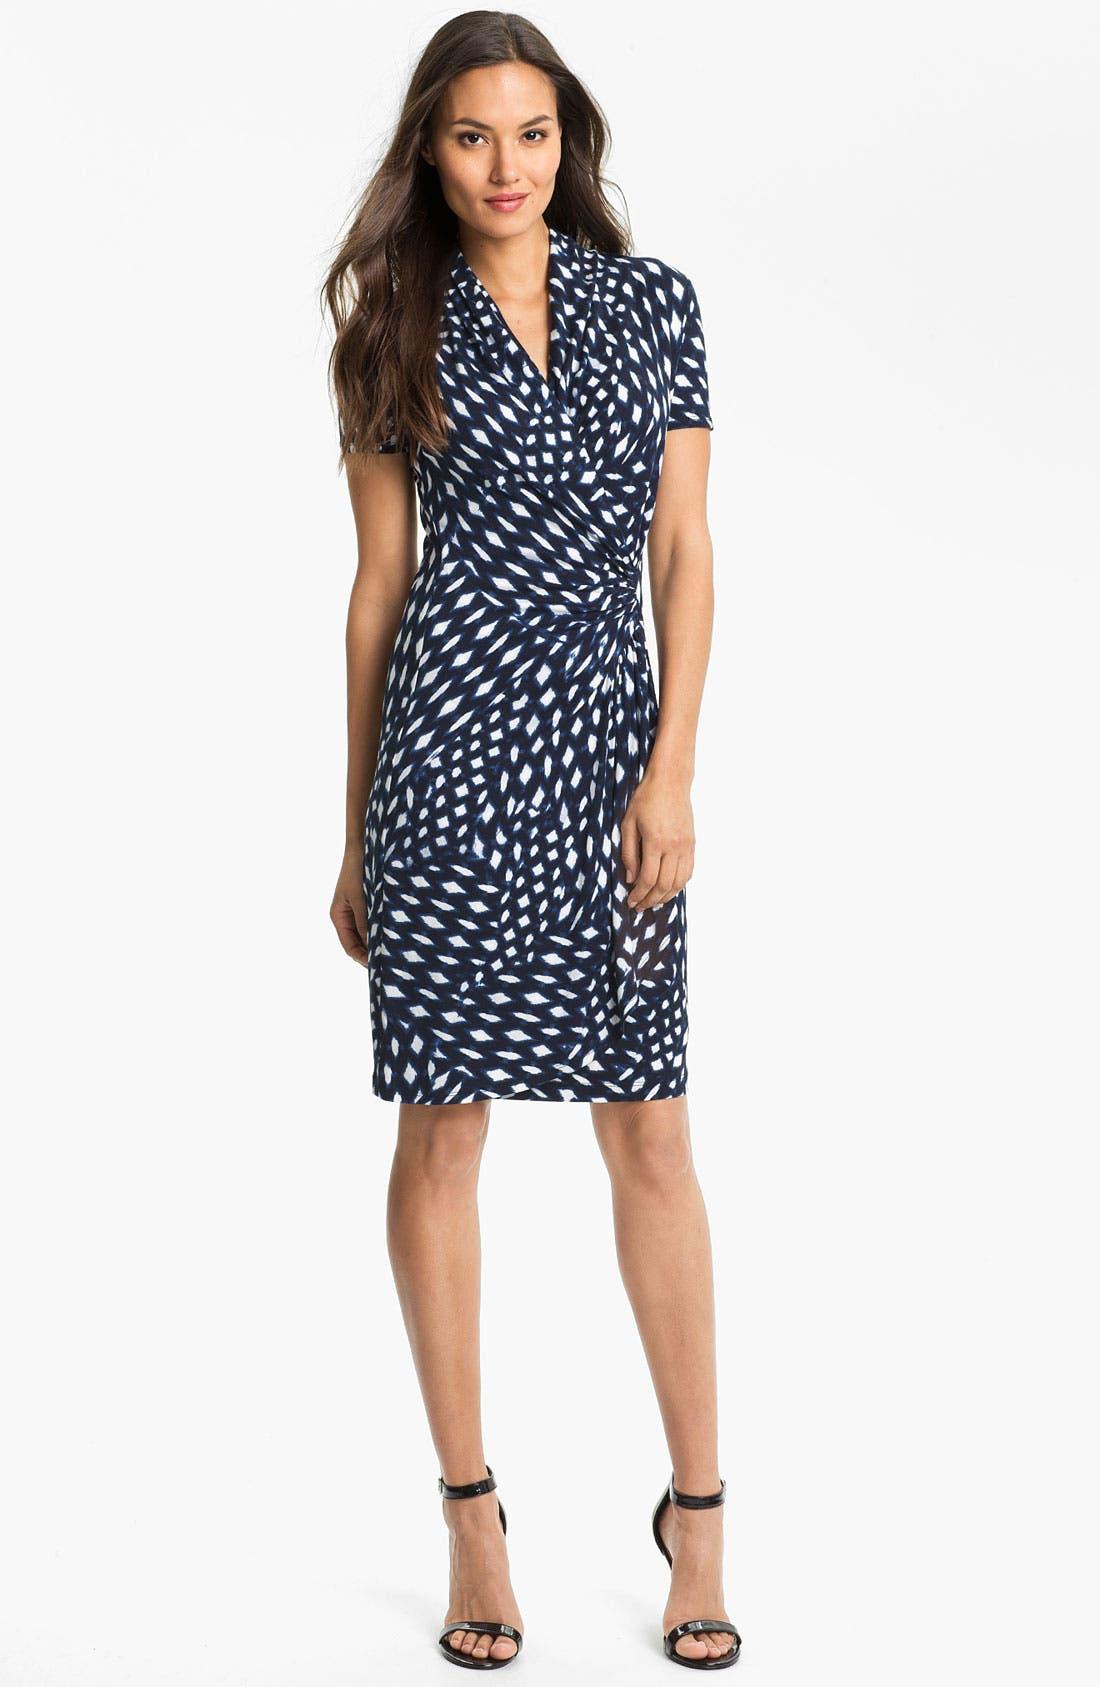 Alternate Image 1 Selected - Karen Kane 'Spot Cascade' Faux Wrap Dress